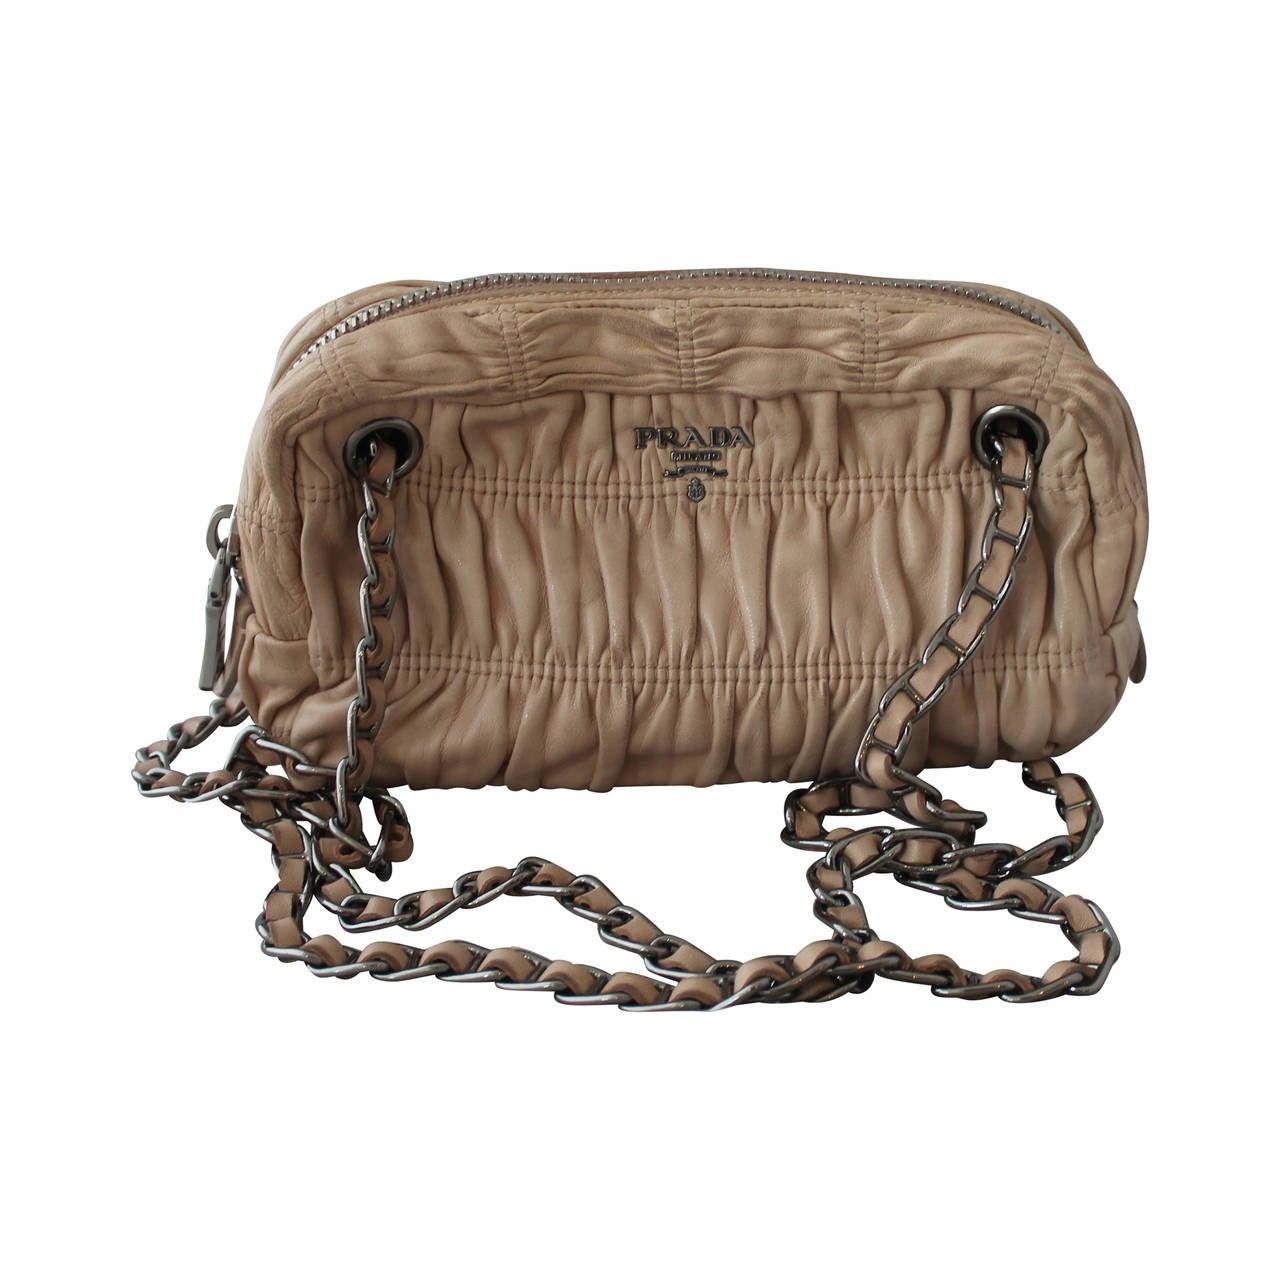 prada patent leather shoulder bag